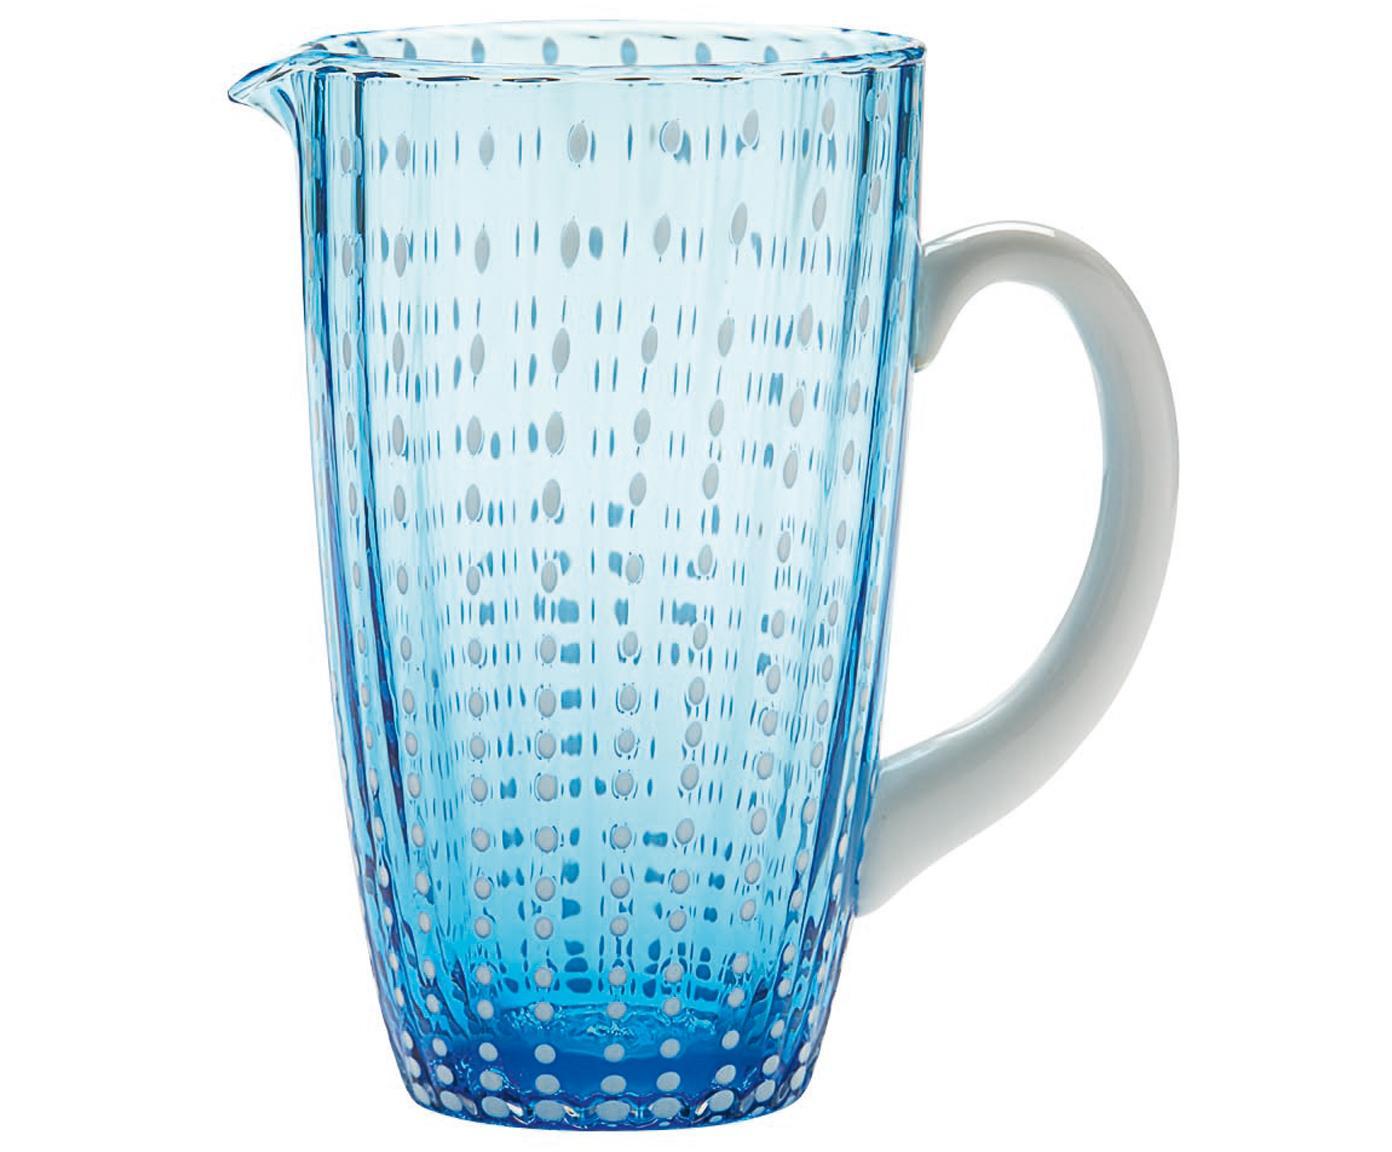 Mundgeblasene Karaffe Perle, Glas, Aqua, Weiß, Transparent, 1.6 L